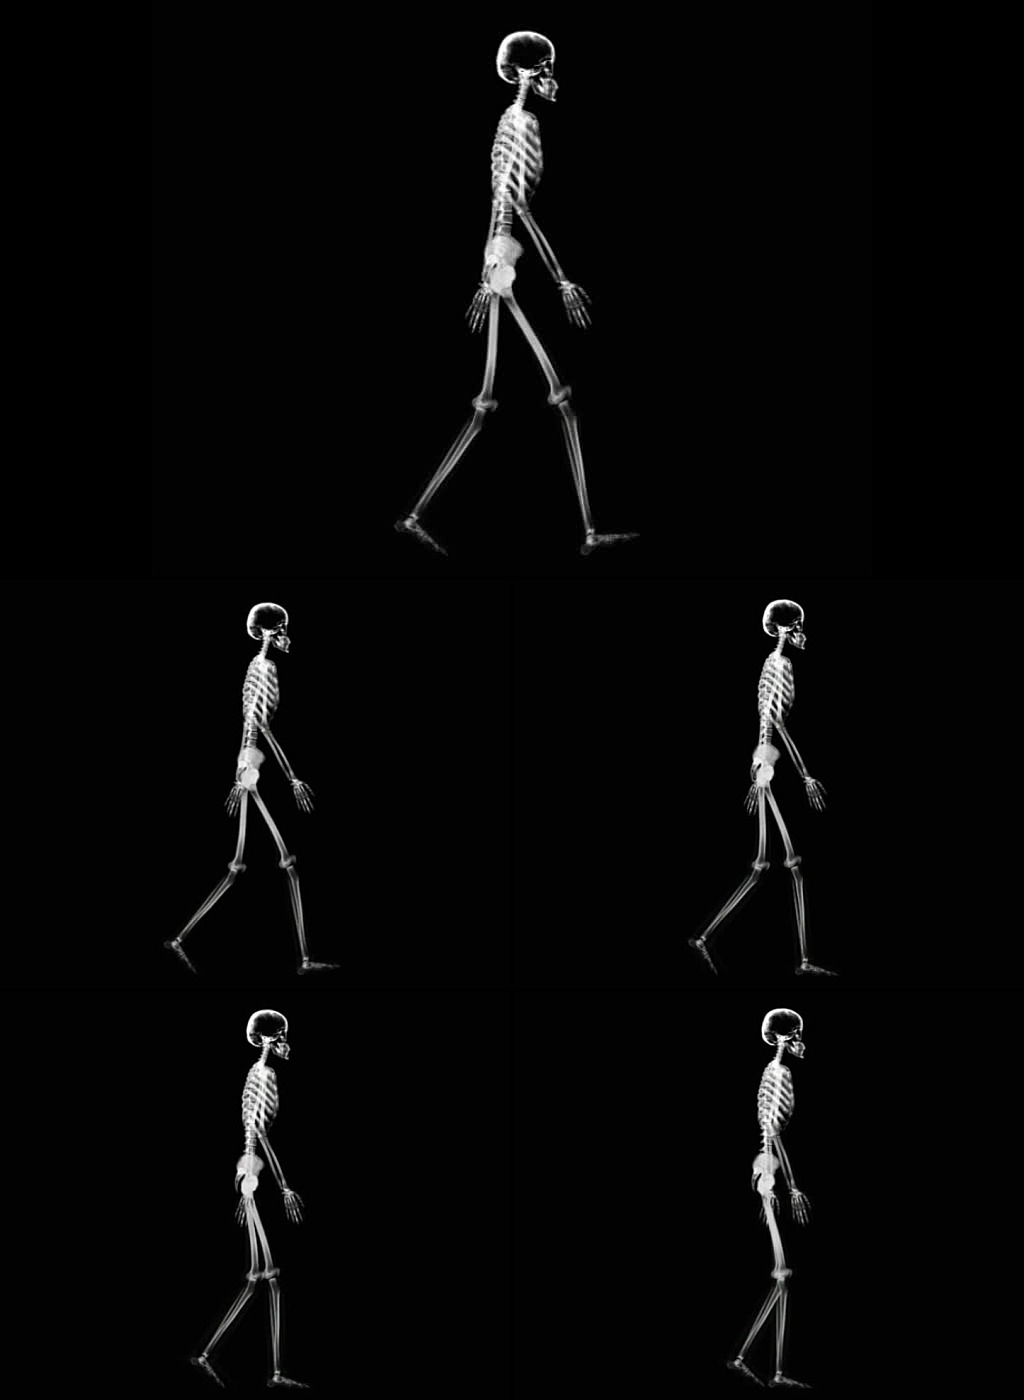 x光透视人体一个人走路